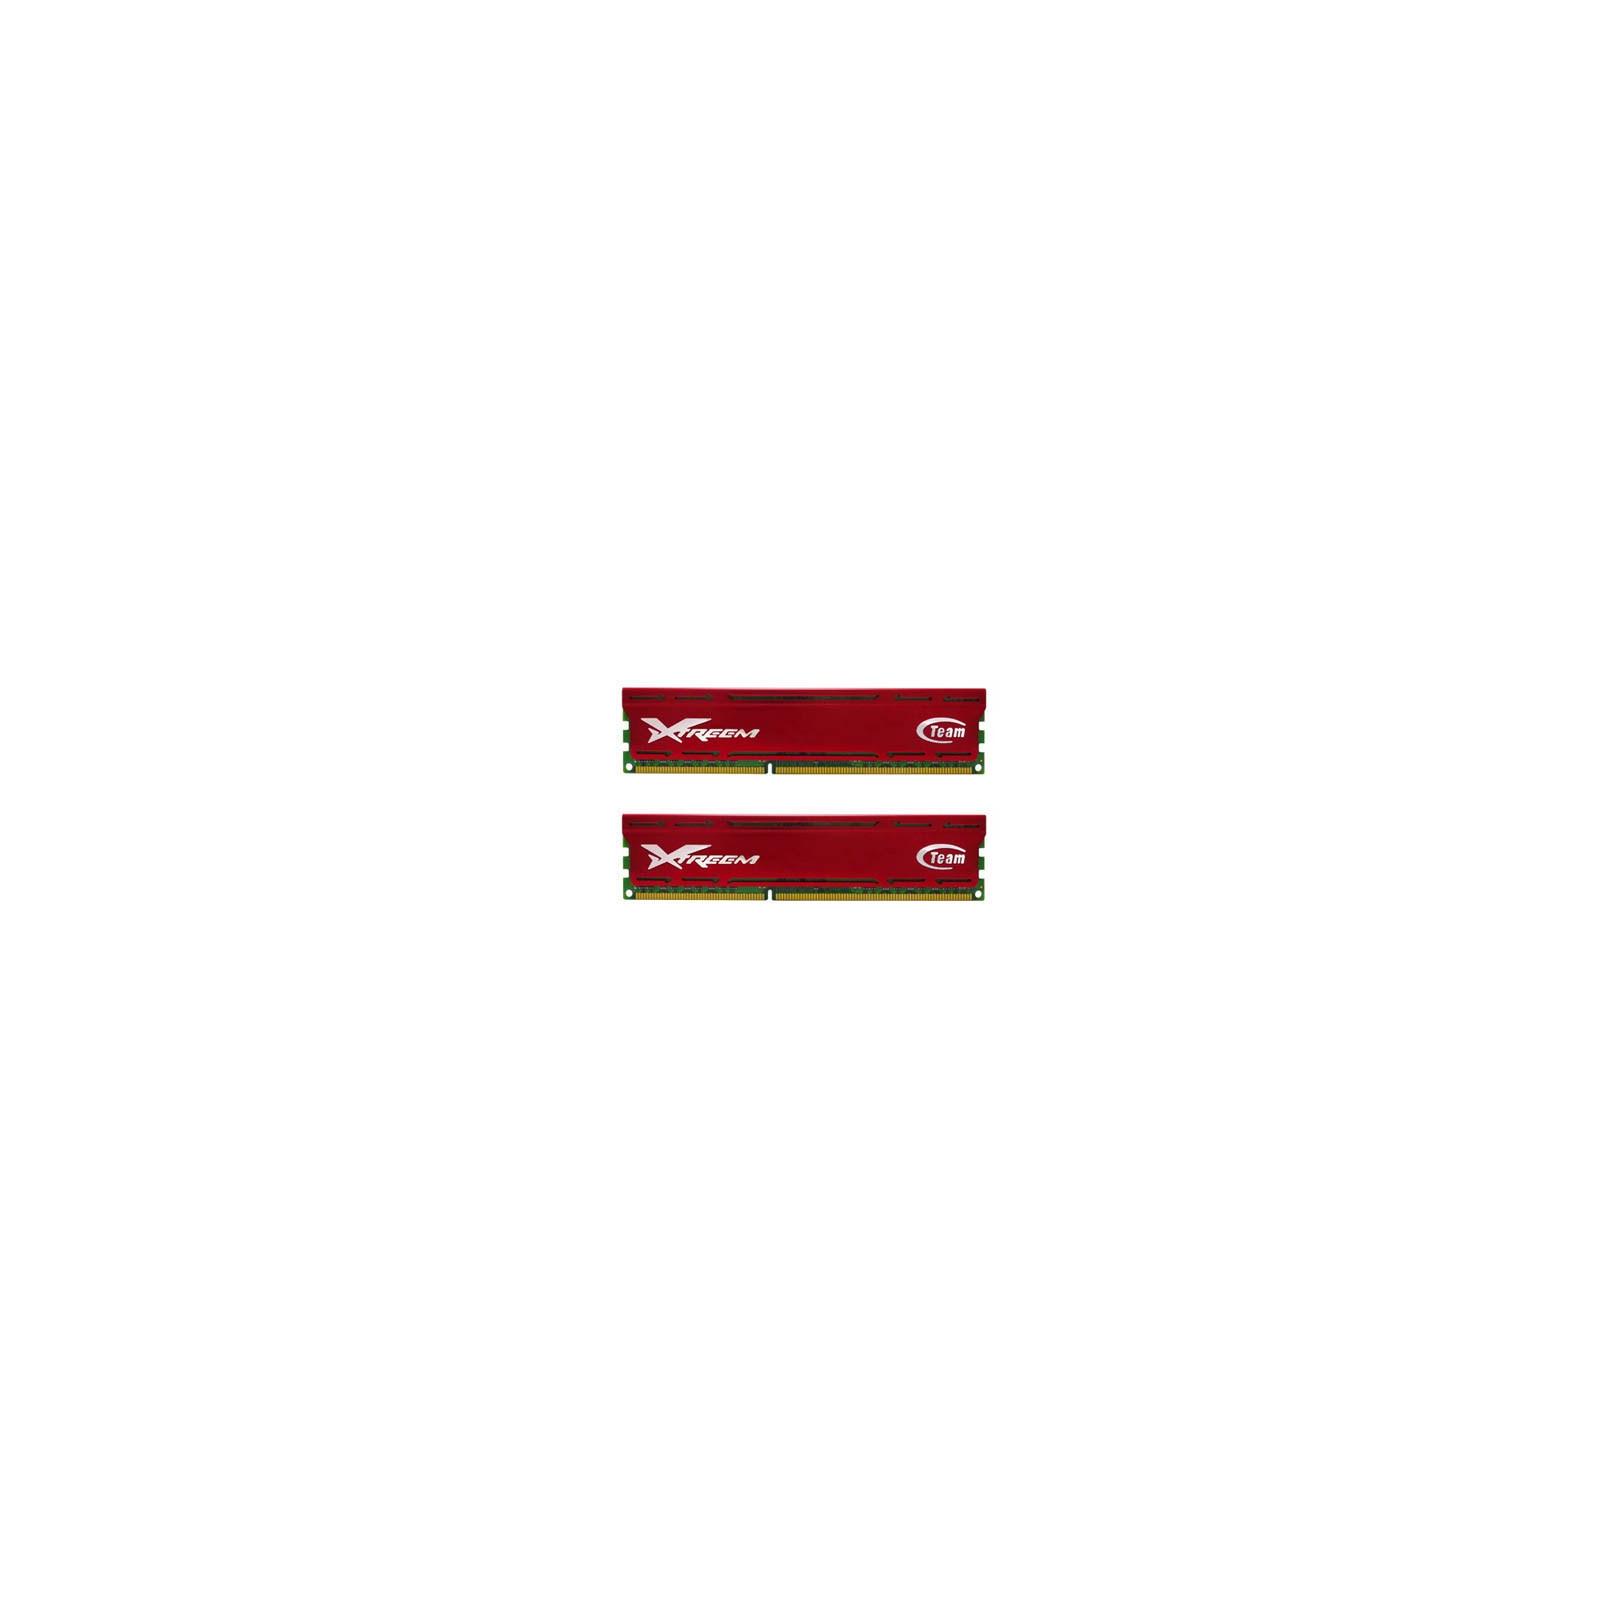 Модуль памяти для компьютера DDR3 32GB (4x8GB) 1866 MHz Team (TLD332G1866HC10SQC01)